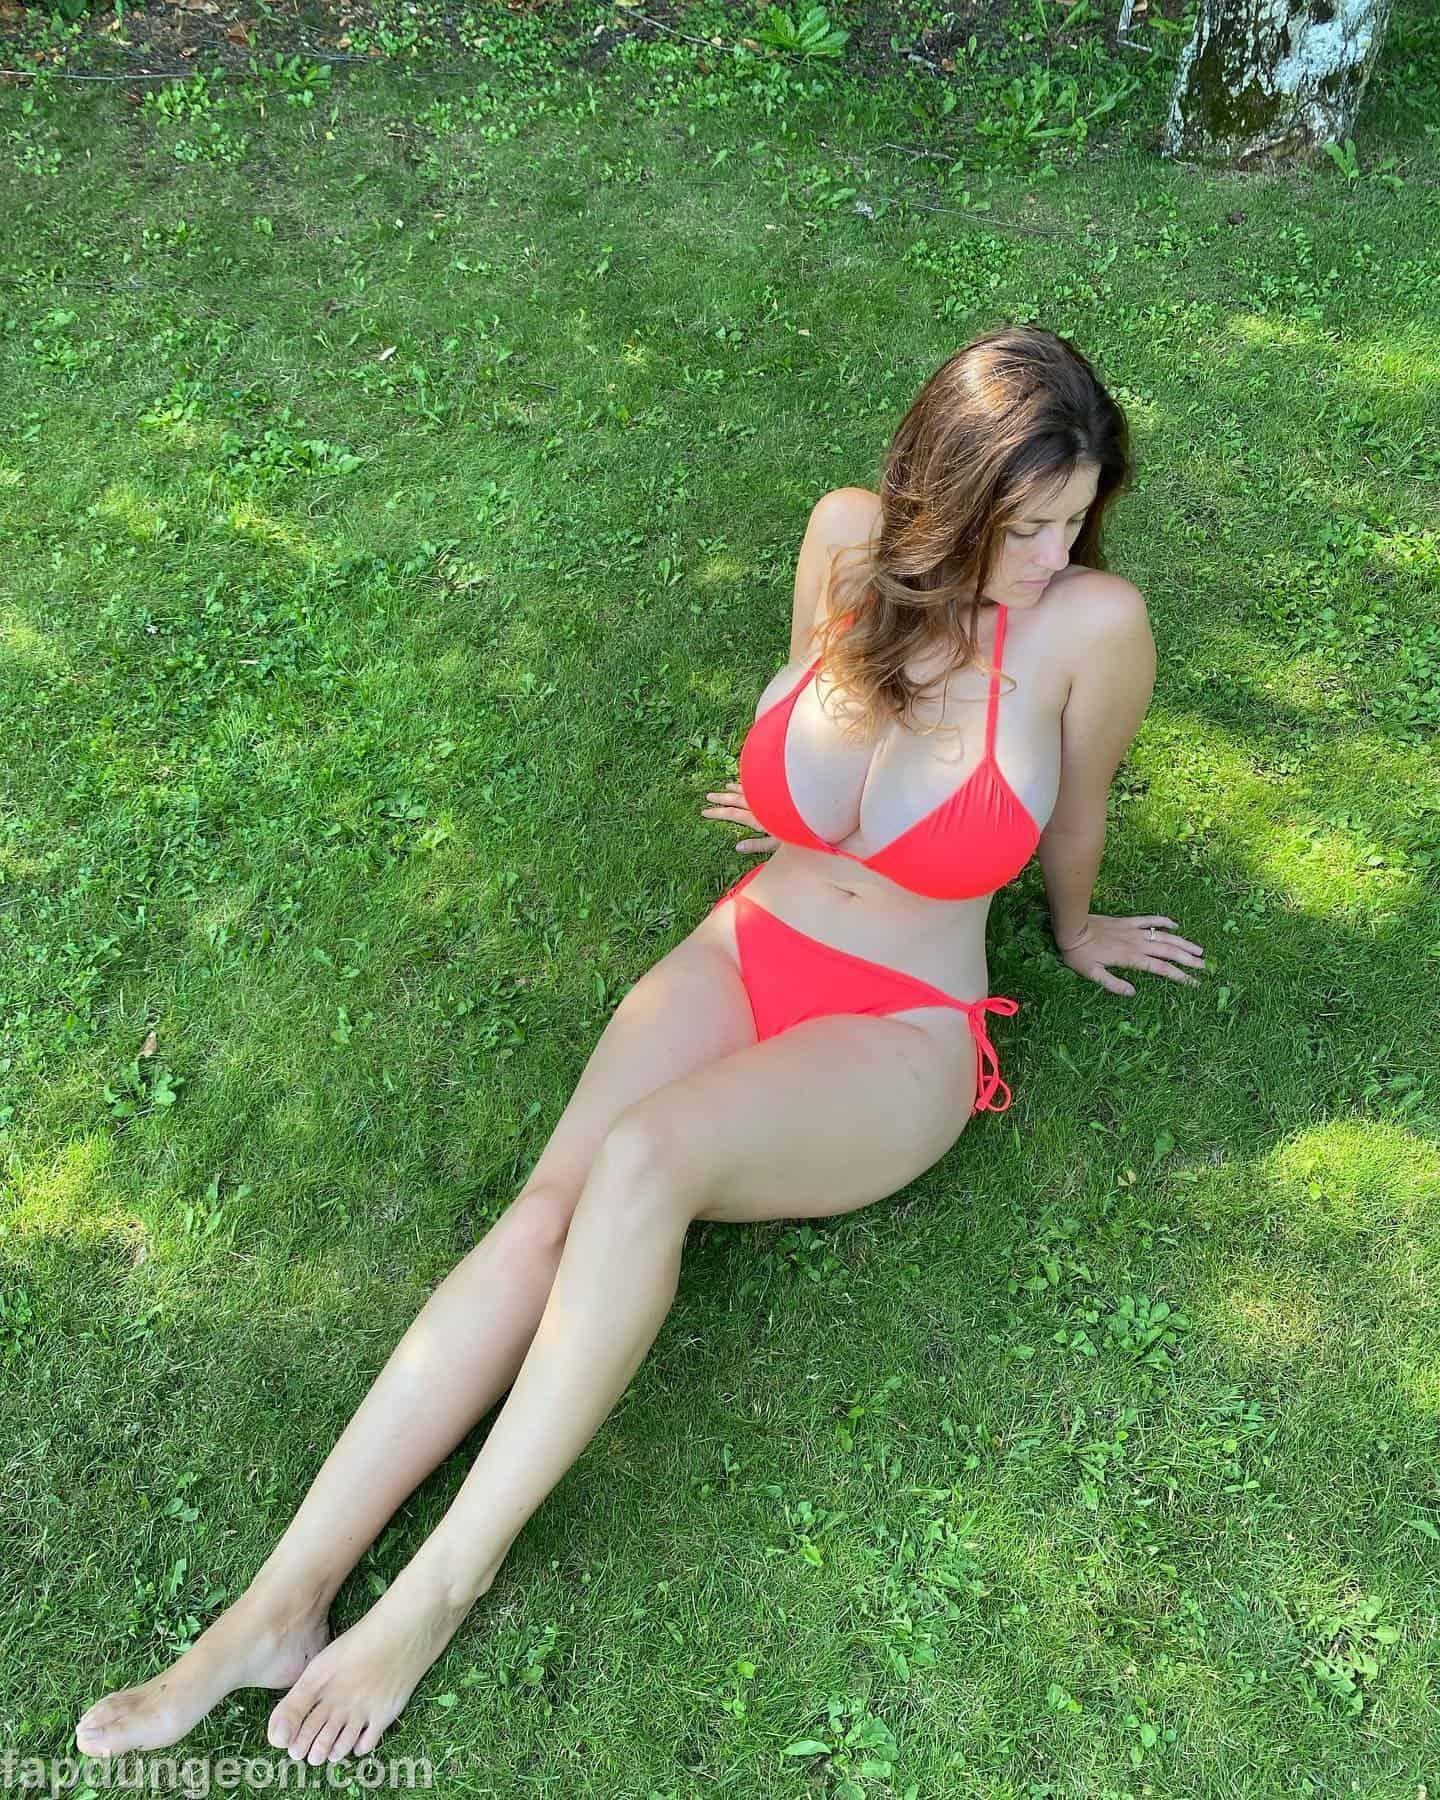 Mady_gio Tits